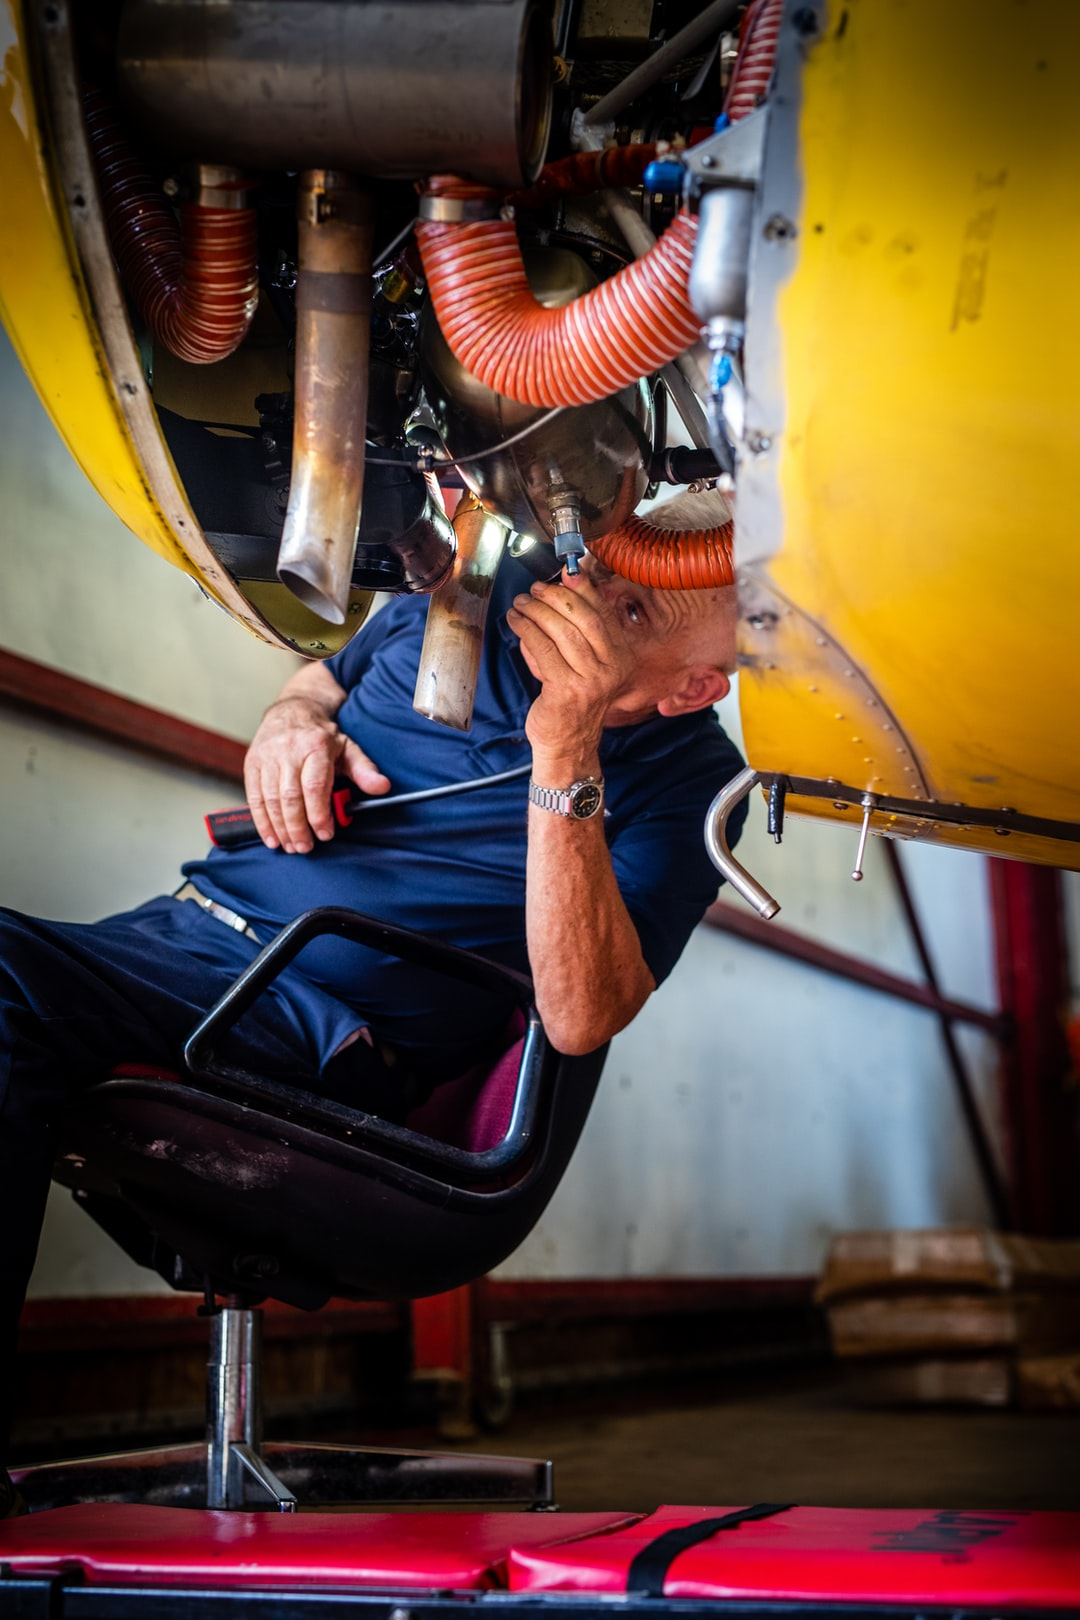 Older man doing maintenance on a plane